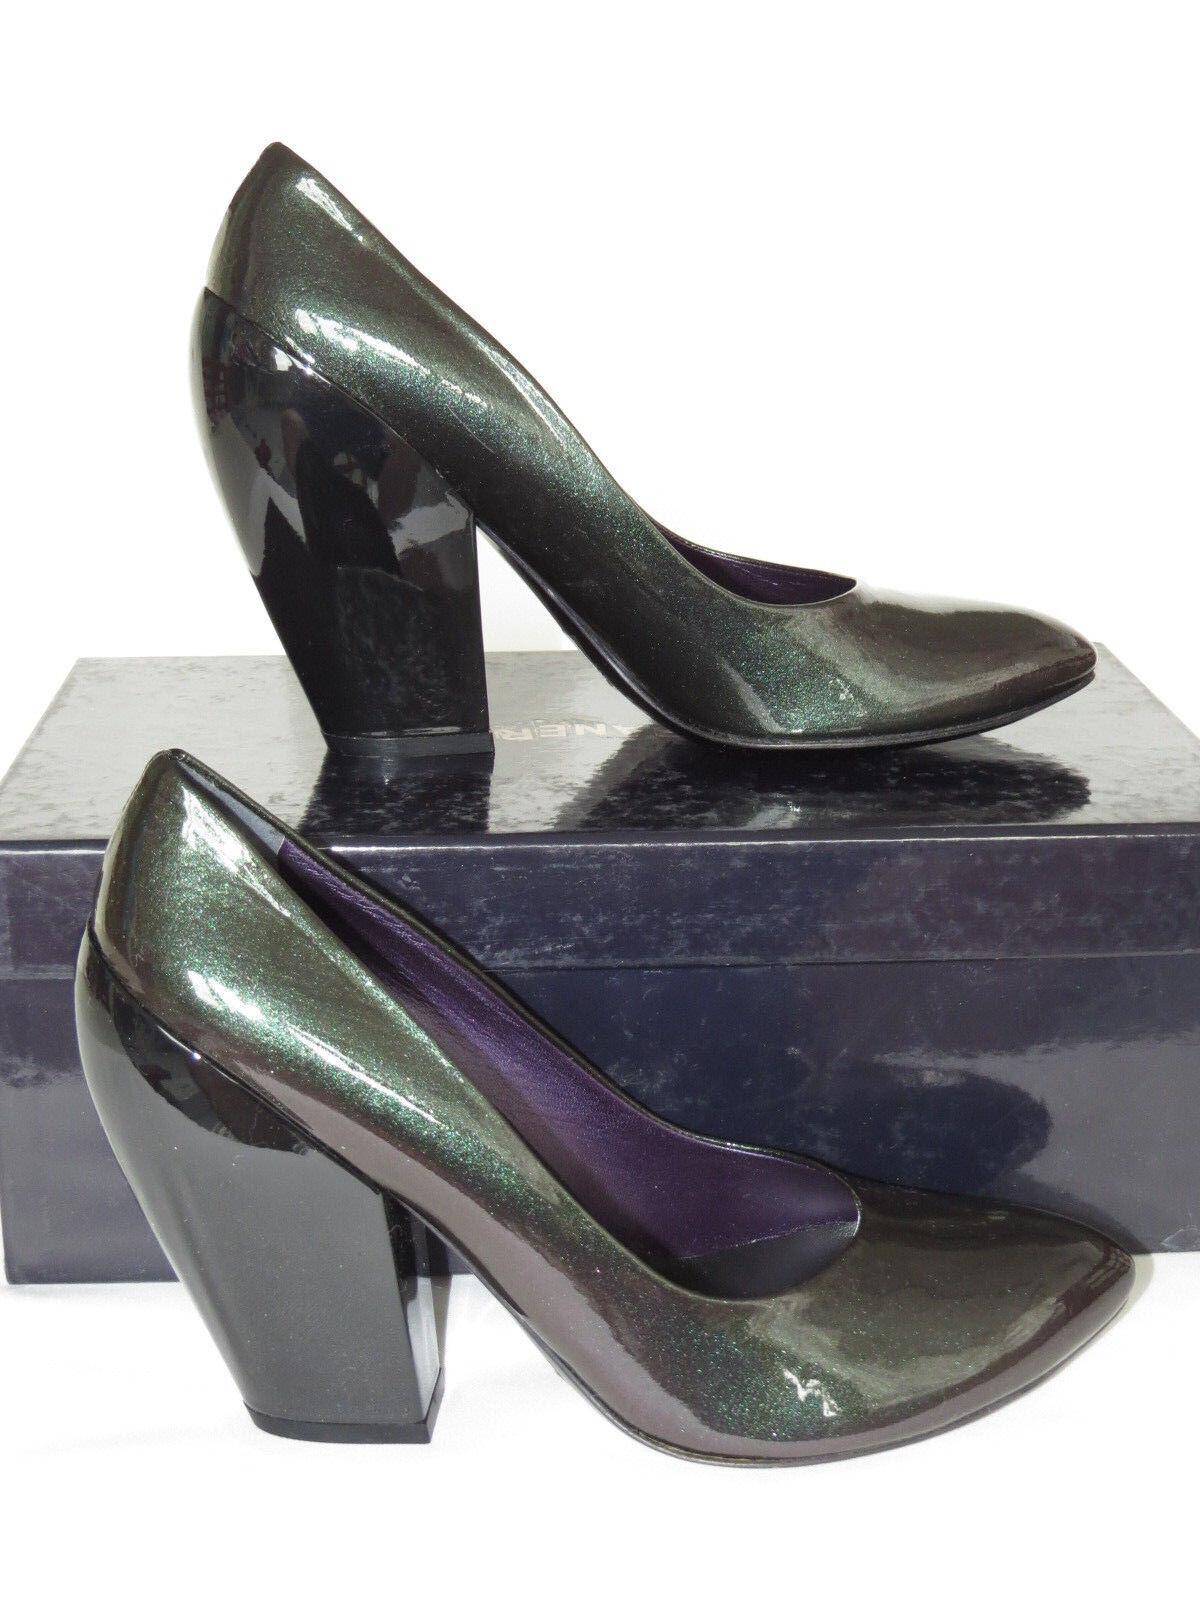 NEW ELISANERO Chameleon Mirror Patent Leder Heels Pumps Sz 38 7.5  475